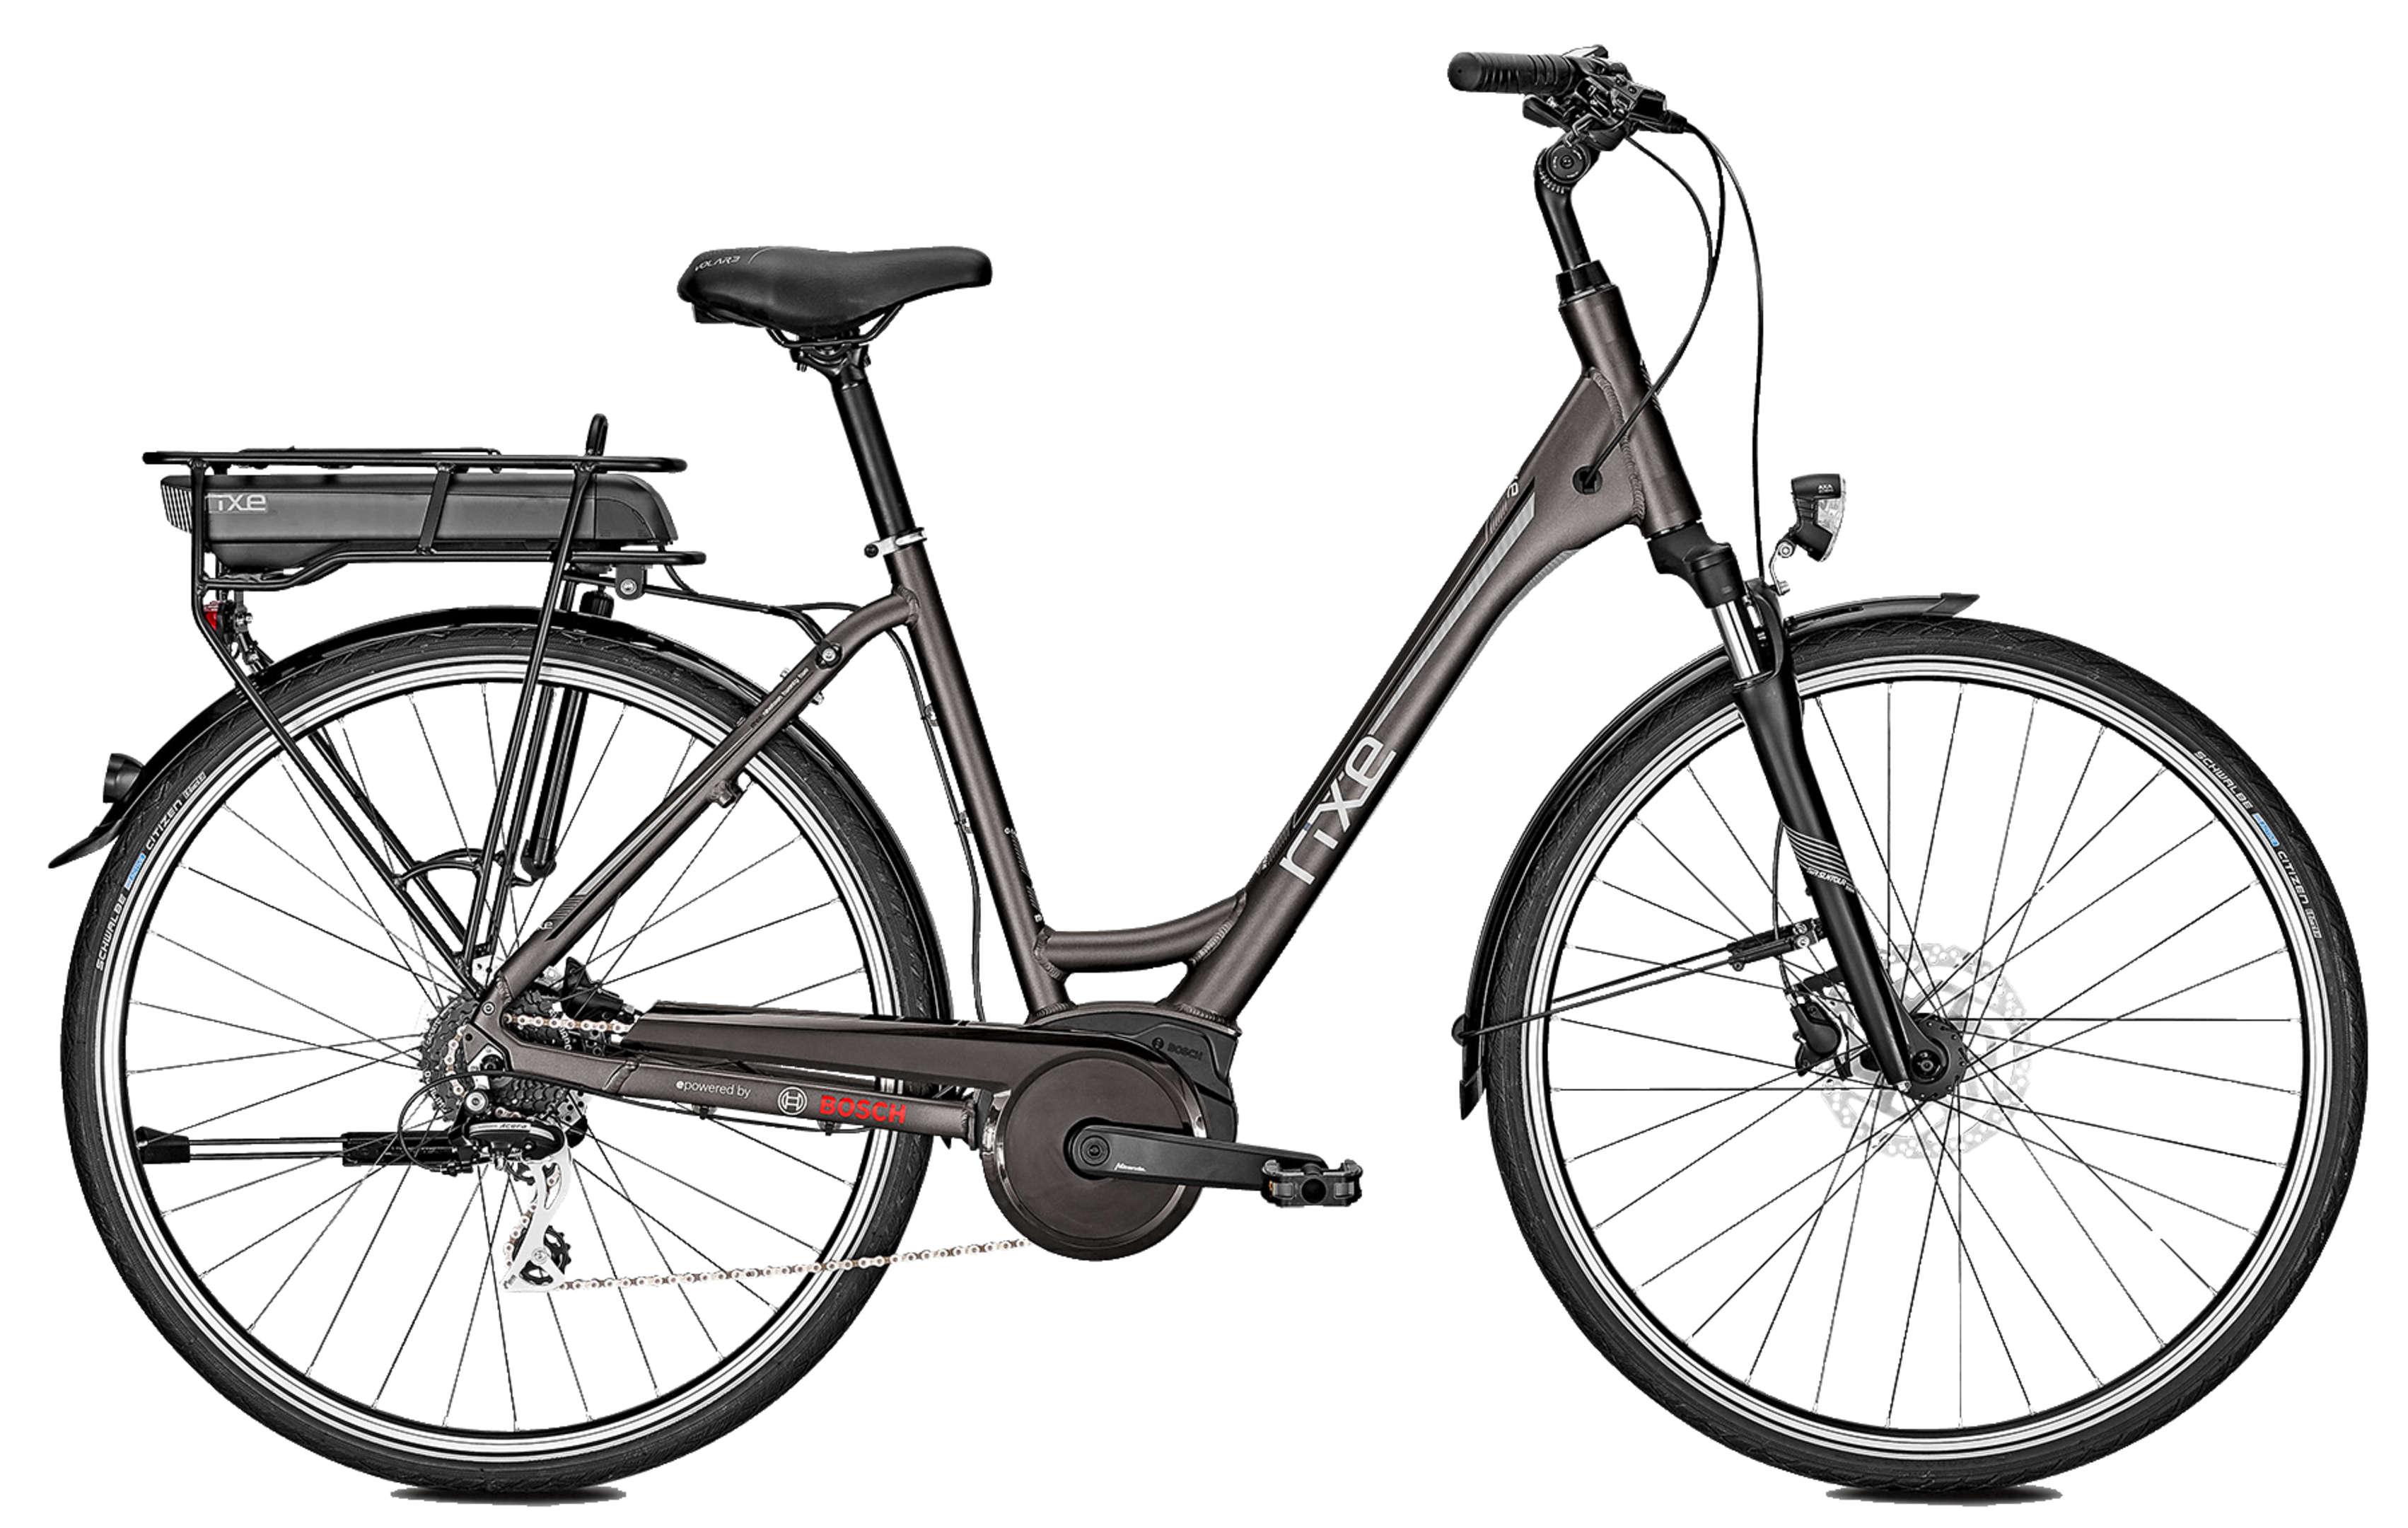 rixe e bike bordeaux b8 disc 11 1ah 36v eurorad. Black Bedroom Furniture Sets. Home Design Ideas